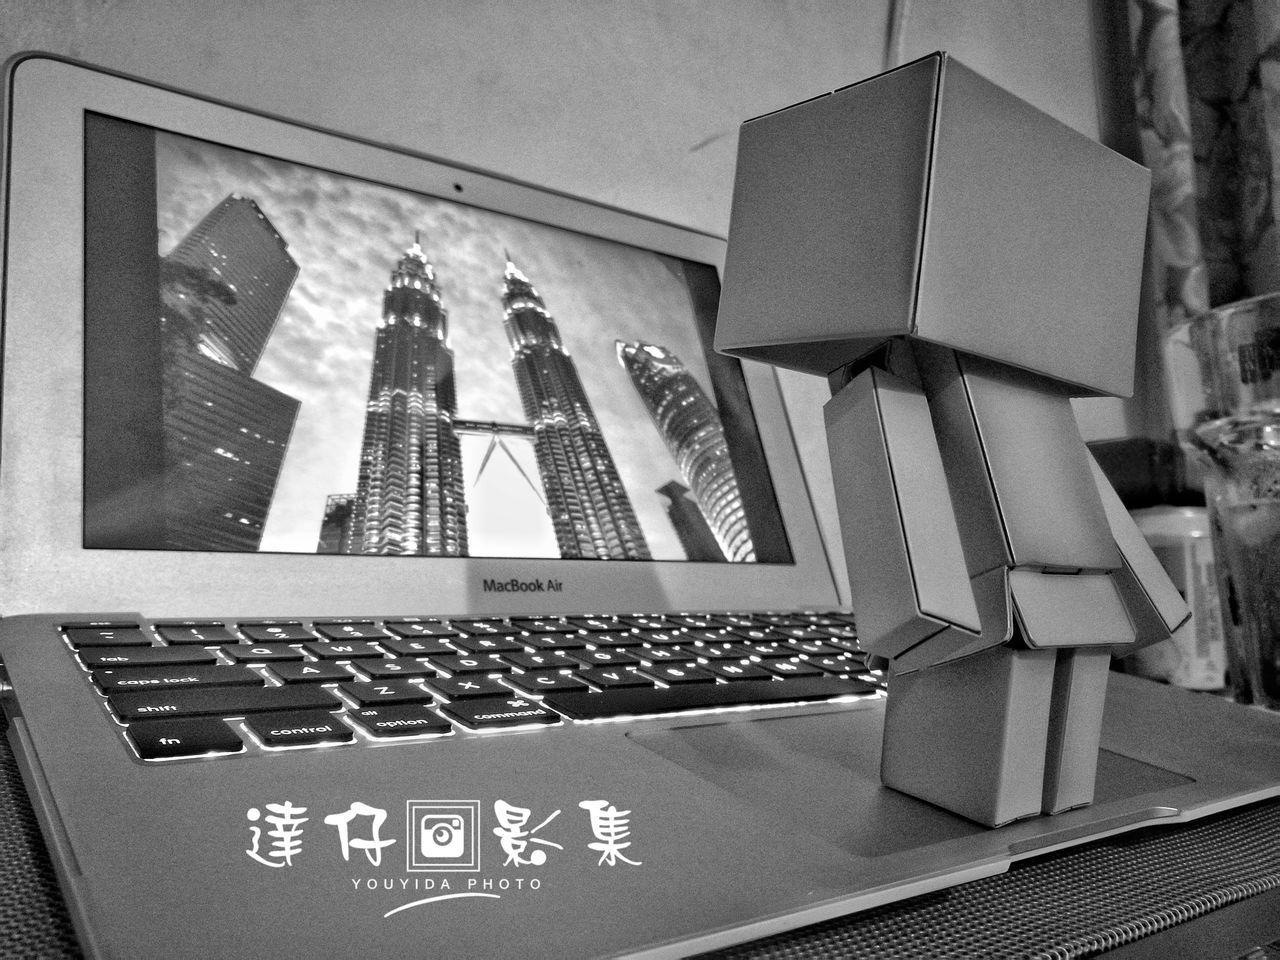 Indoors  No People Day HuaweiP9 KLCC Tower KLCC Twin Towers Klcc Huawei P9 Plus HuaweiP9plus HuaweiP9Photography Huawei P9. Huawei P9 Leica Huaweip9photos Danboard Danboard_fan Danboards